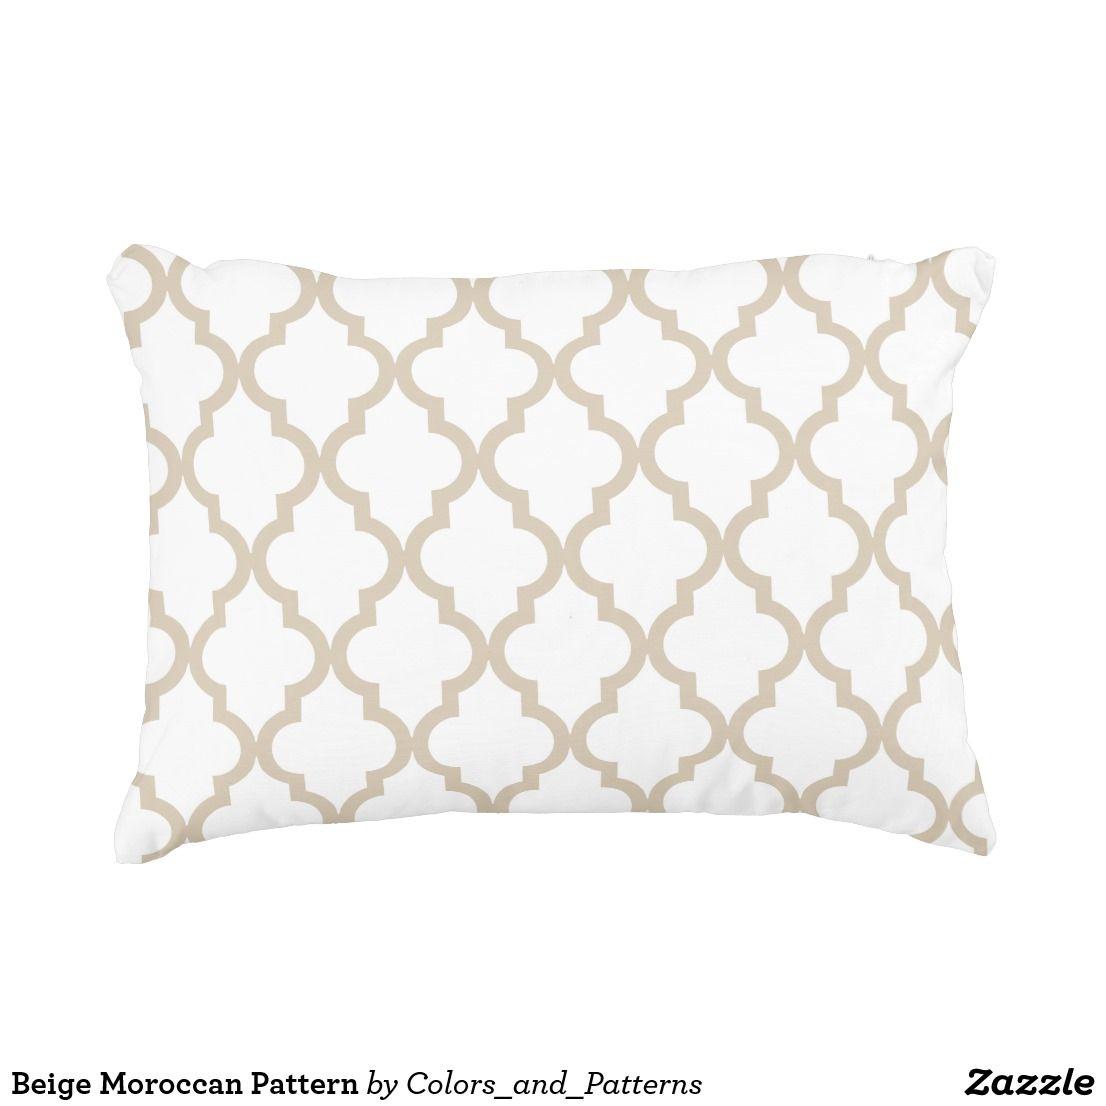 Beige Moroccan Pattern Accent Pillow Beige Pillows Decorative